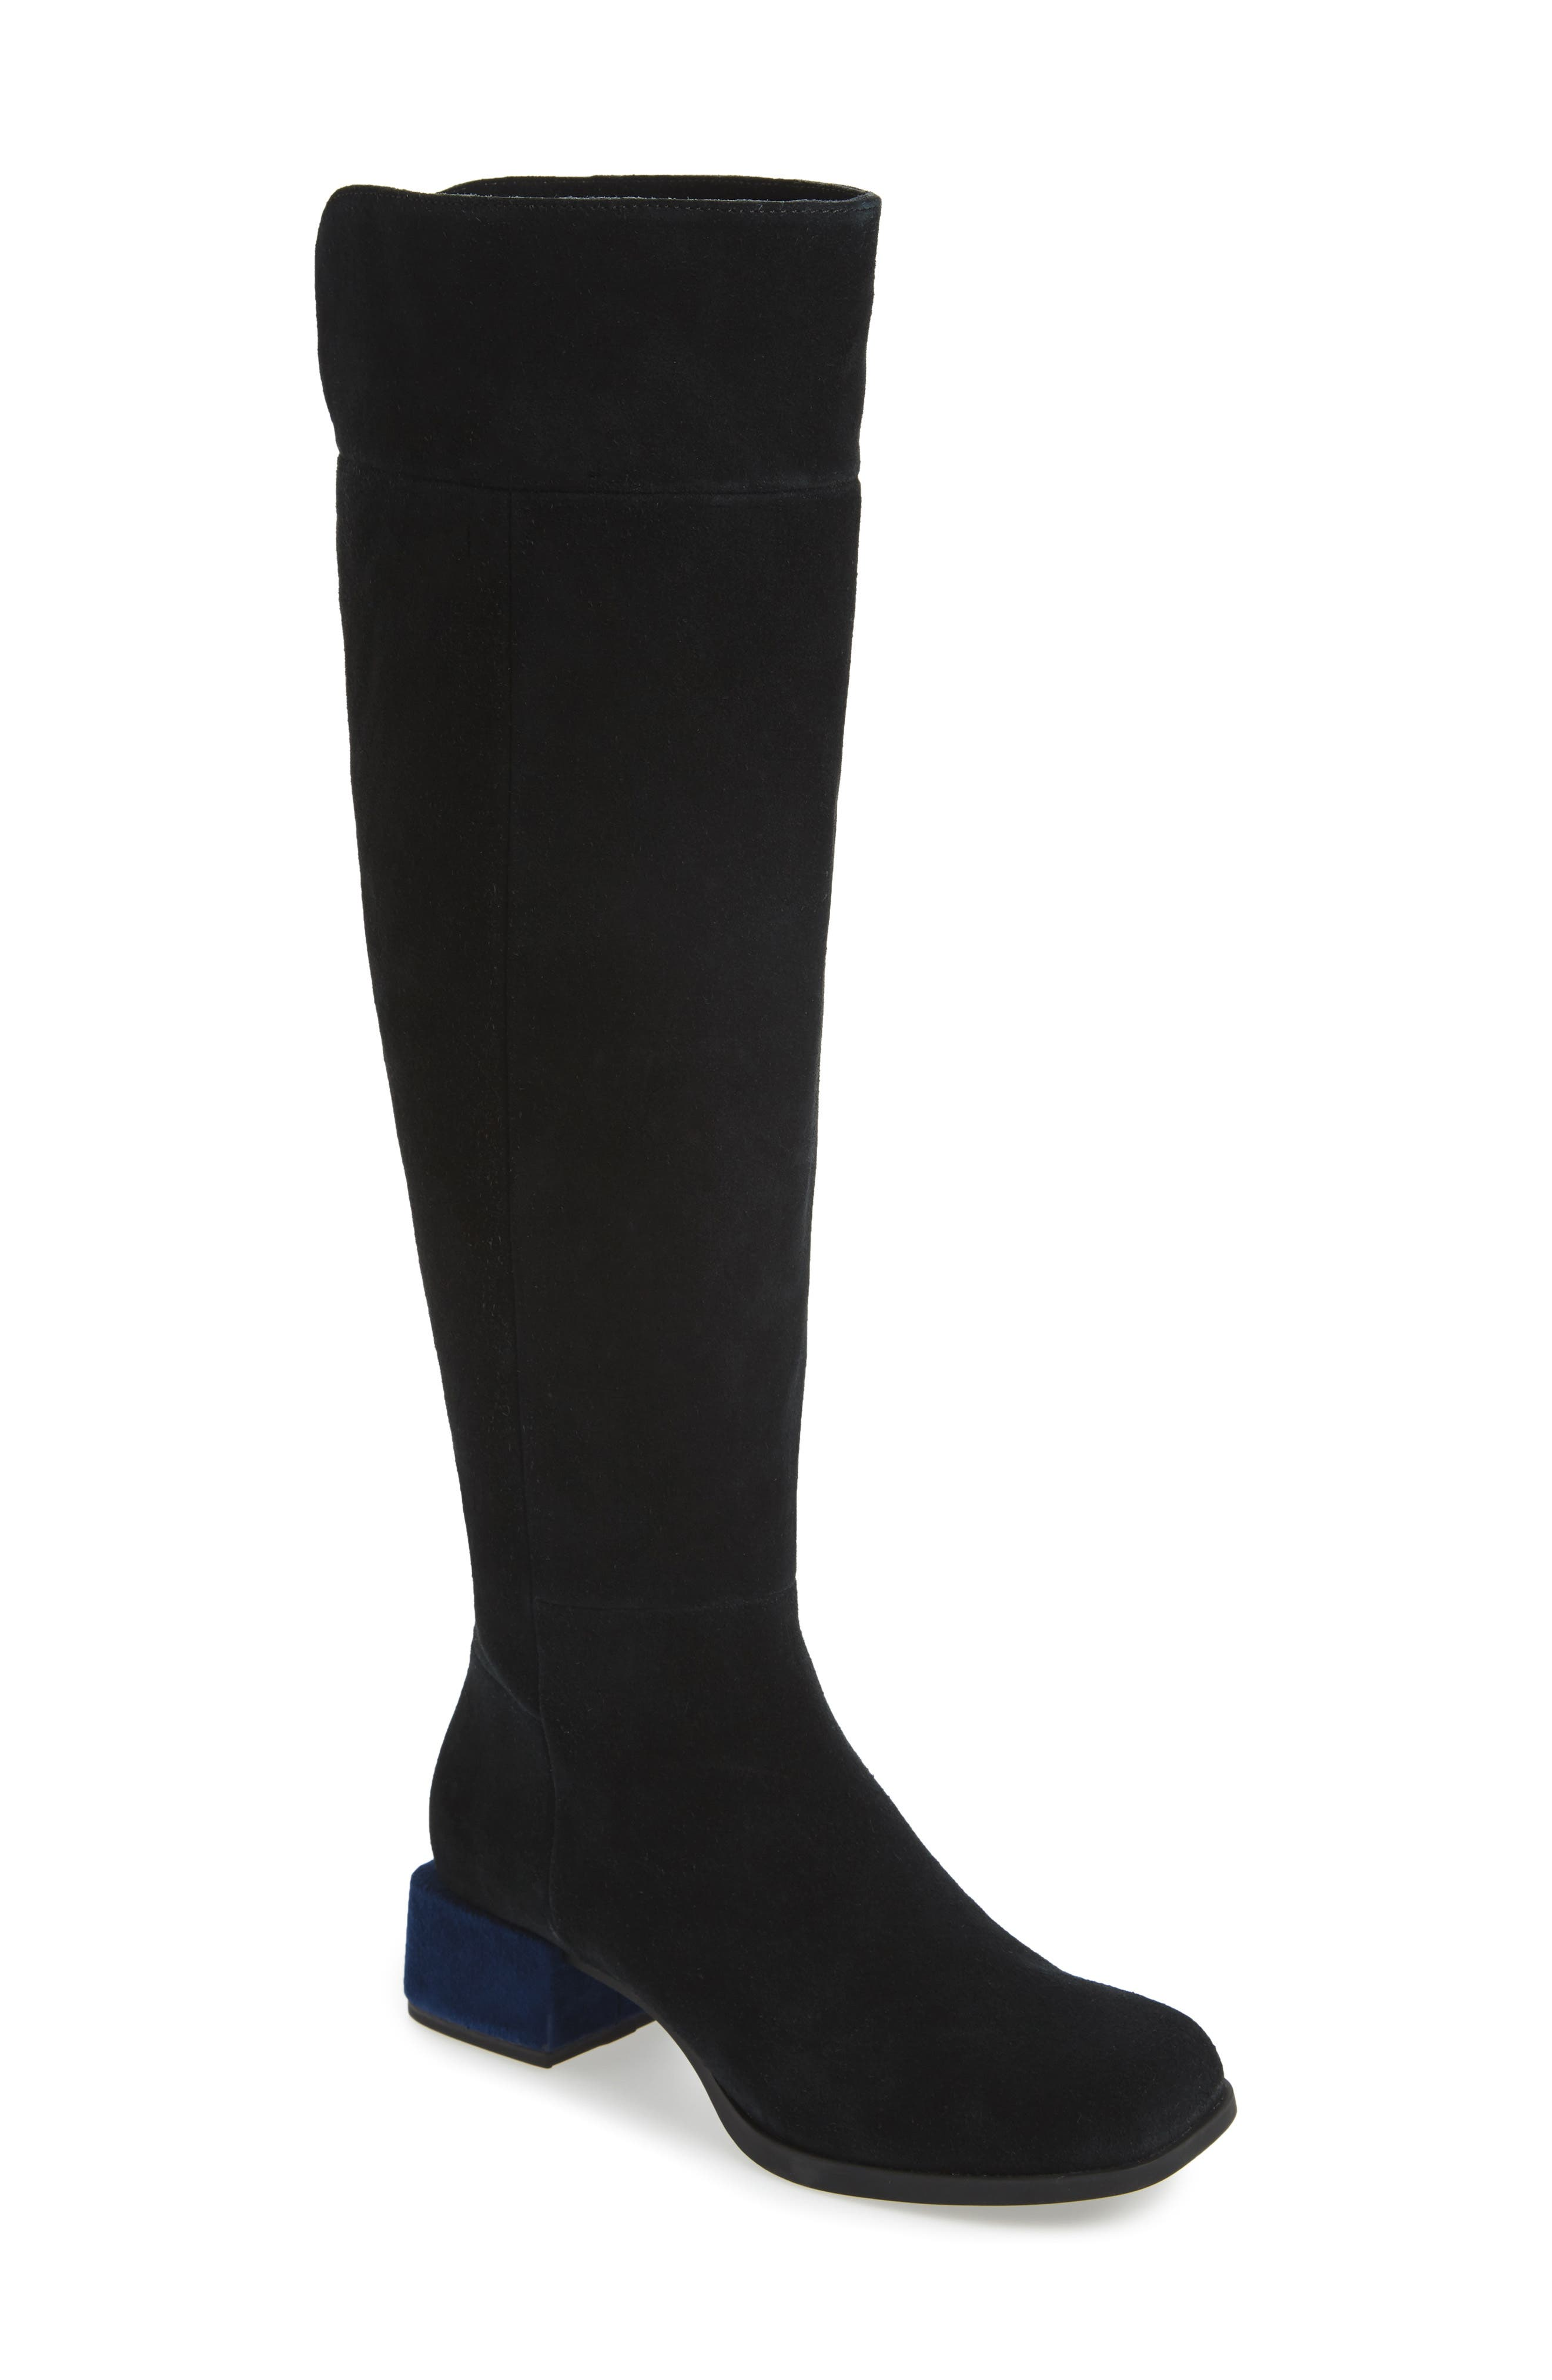 Kobo Knee High Boot,                         Main,                         color,